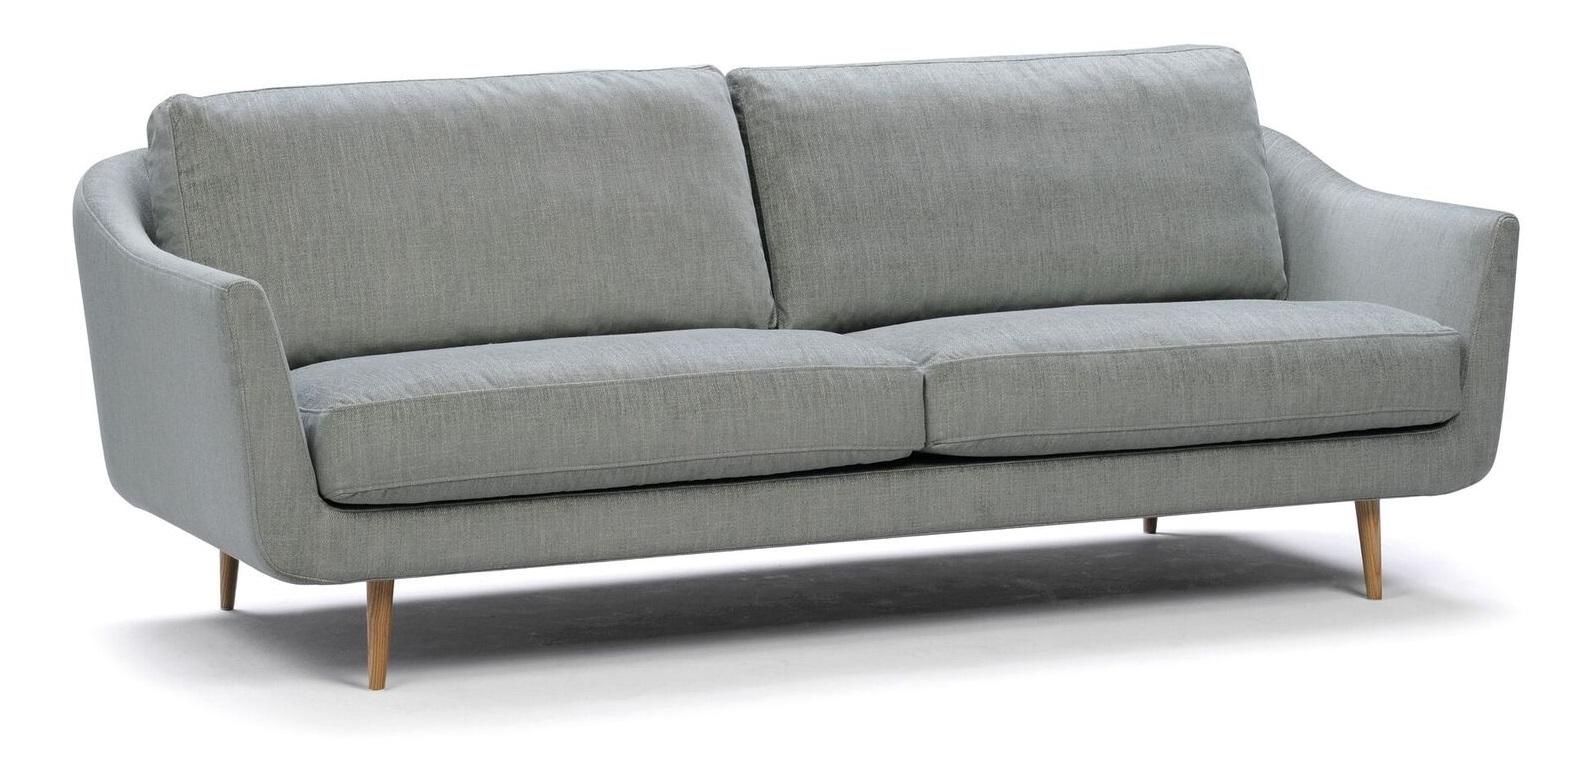 Duna 3-sits soffa